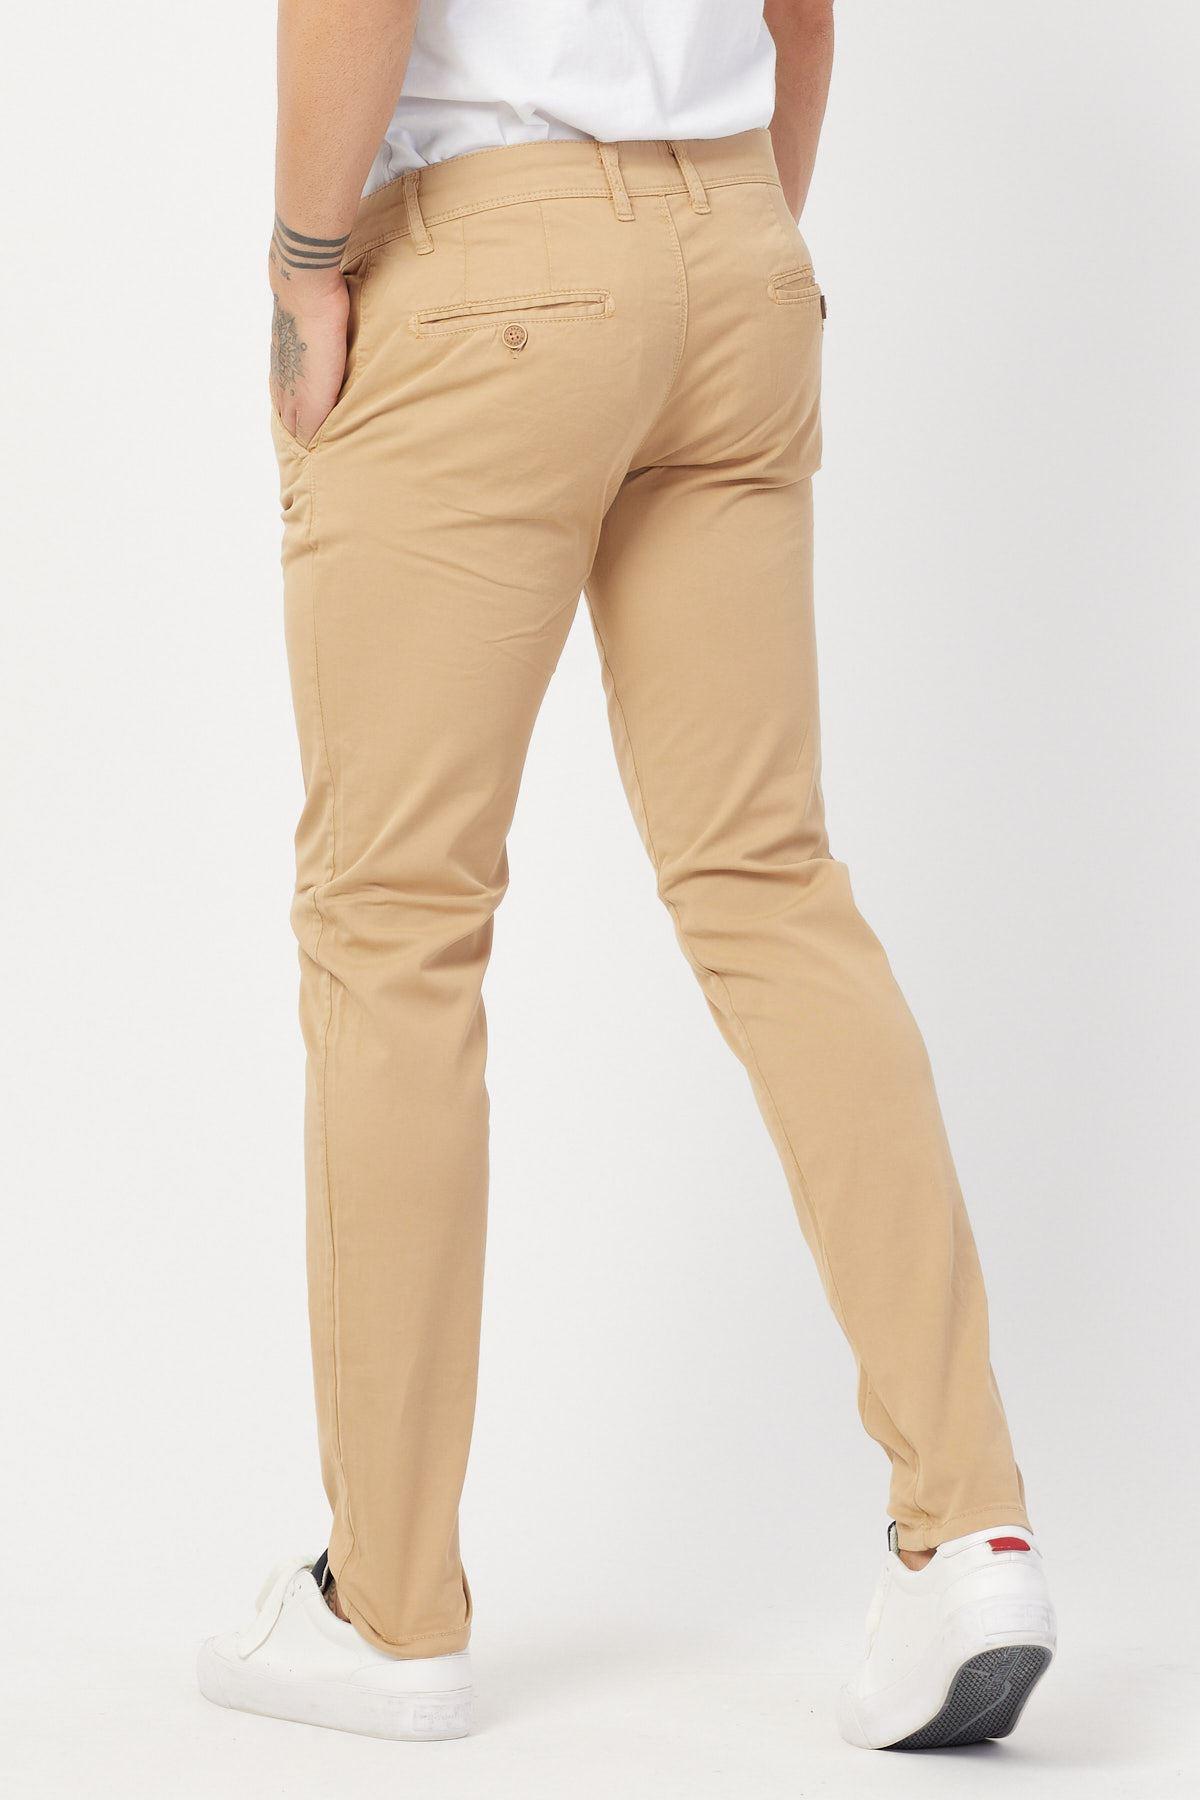 Yandan Cepli Camel Keten Pantolon